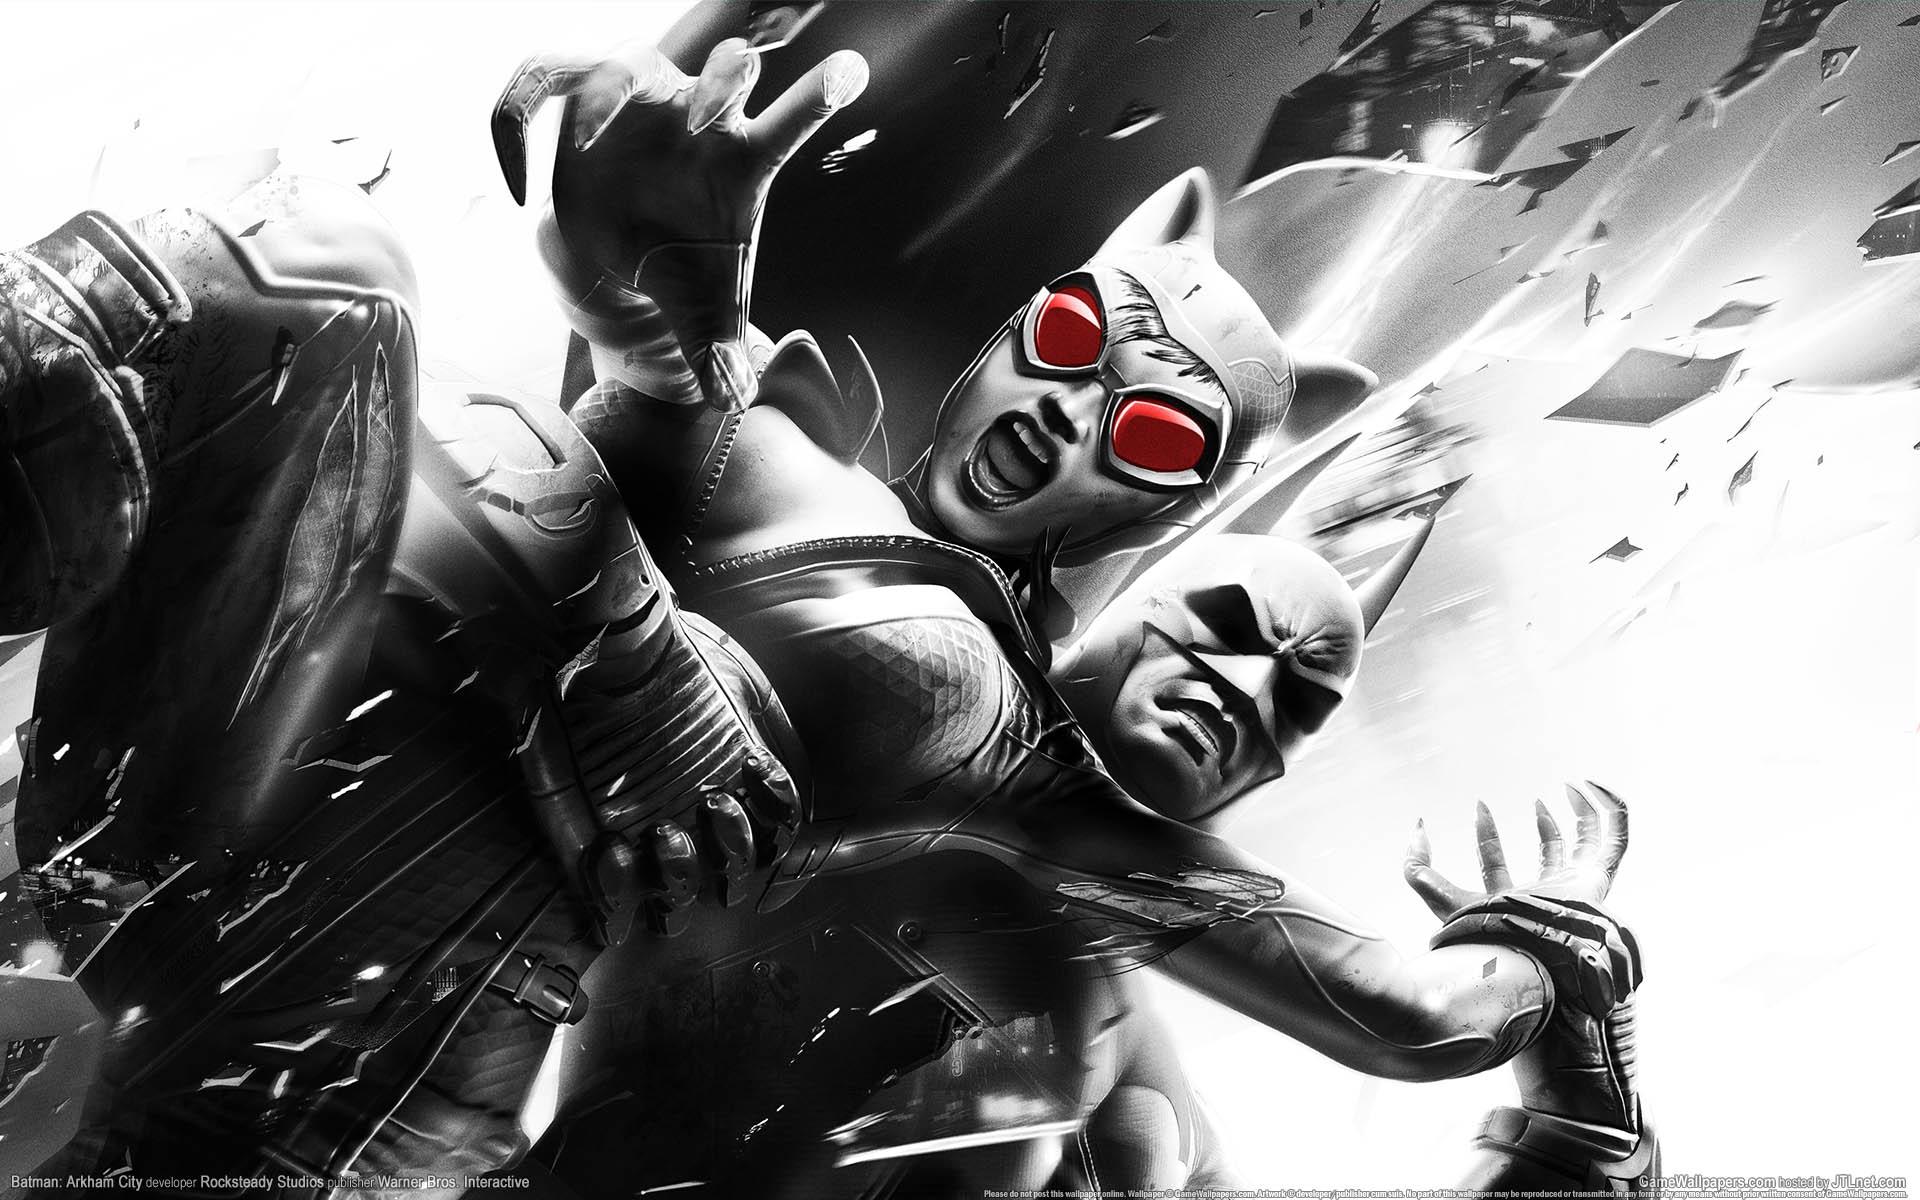 Free Download Batman Arkham City Wallpaper Game Wallpaper Hd